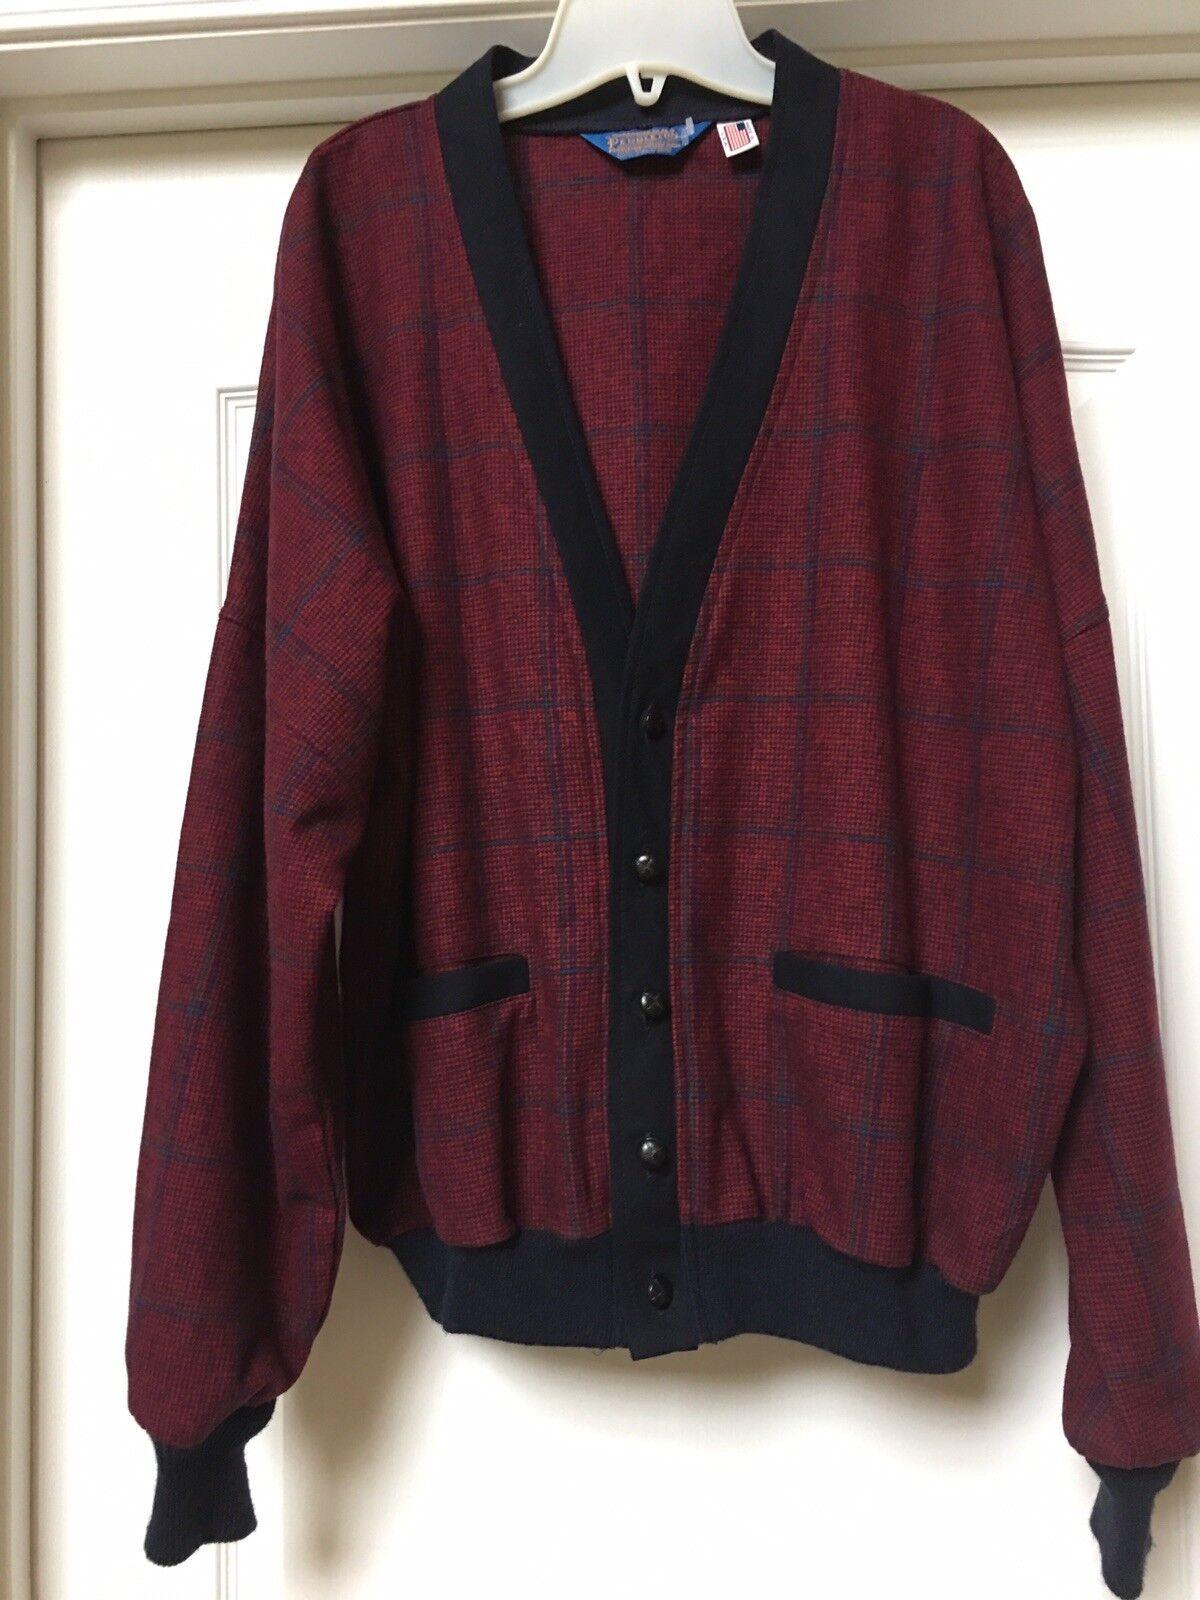 Vtg Pendelton Cardigan  Herren Made in USA 100% Wool Burgundy/ Blau, Größe 1X